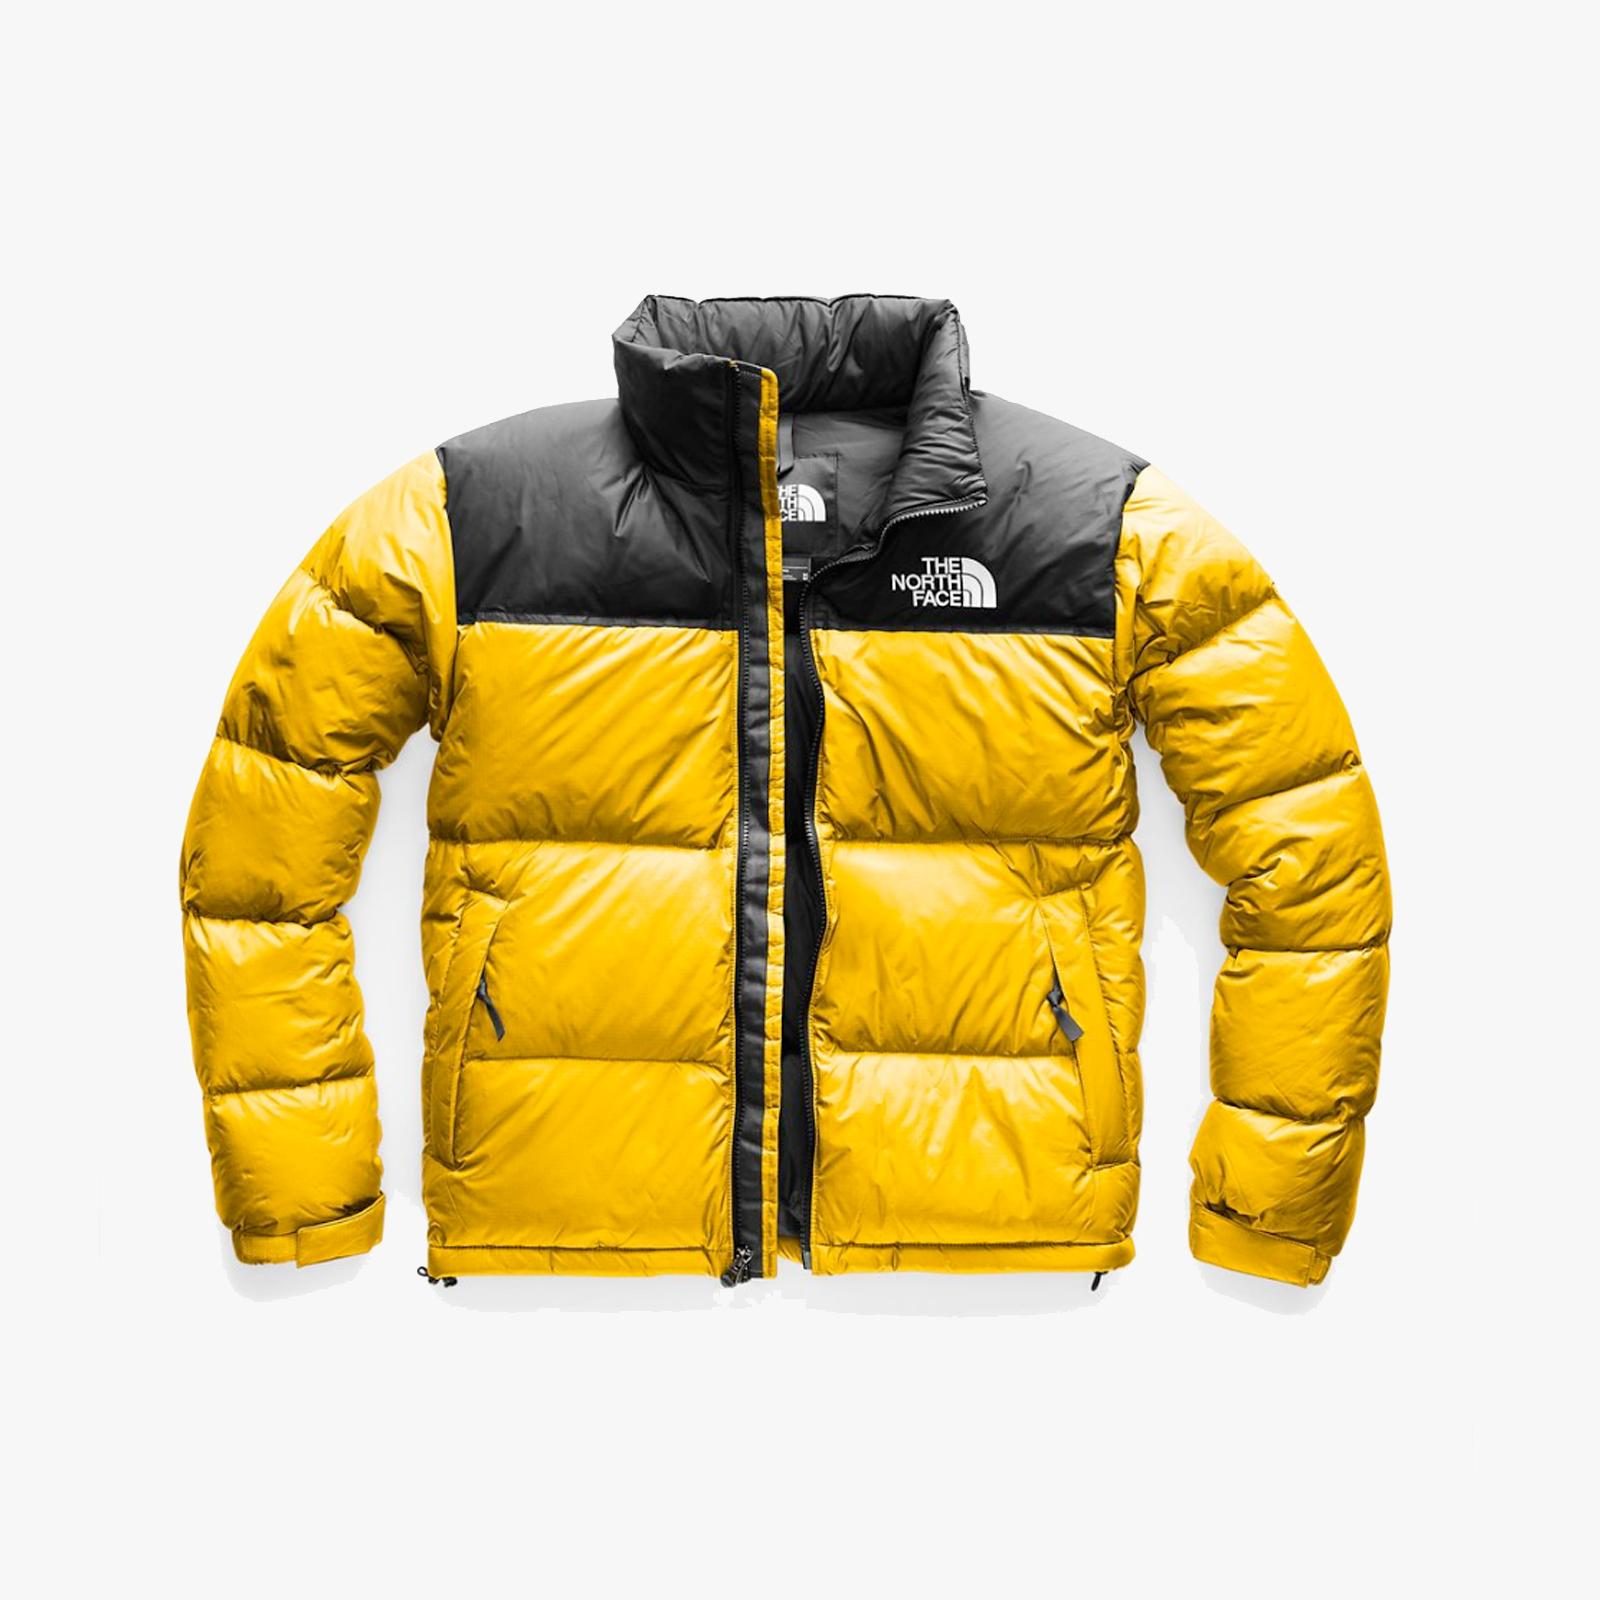 bdf1482c7 The North Face 1996 Retro Nuptse Jacket - Nf0a3c8d70m ...